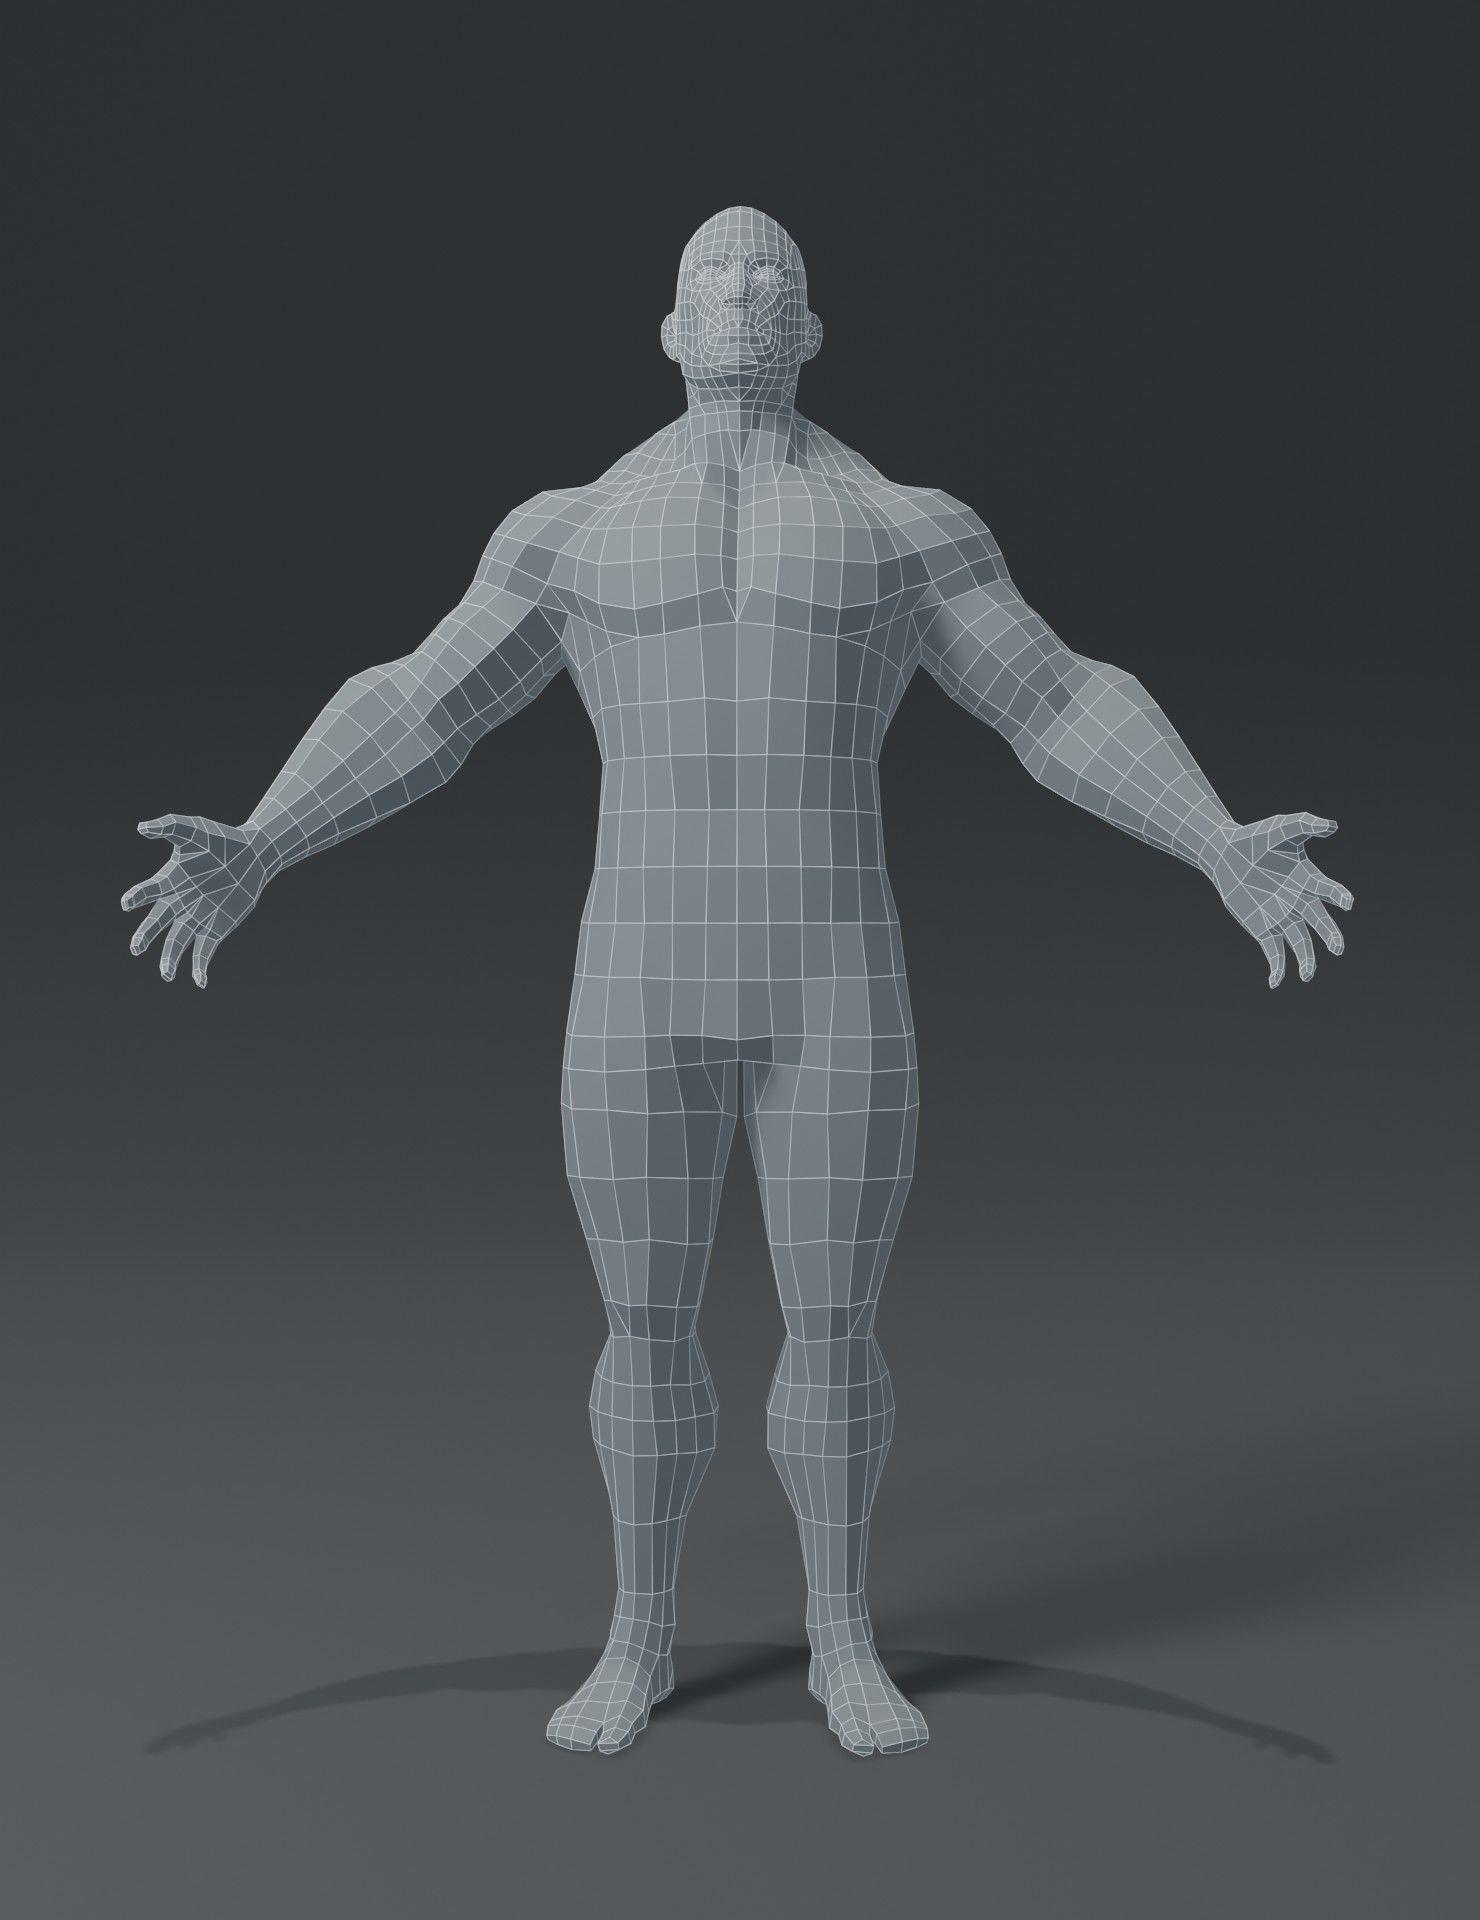 Male Body Base : ArtStation, Superhero, Model, Assets